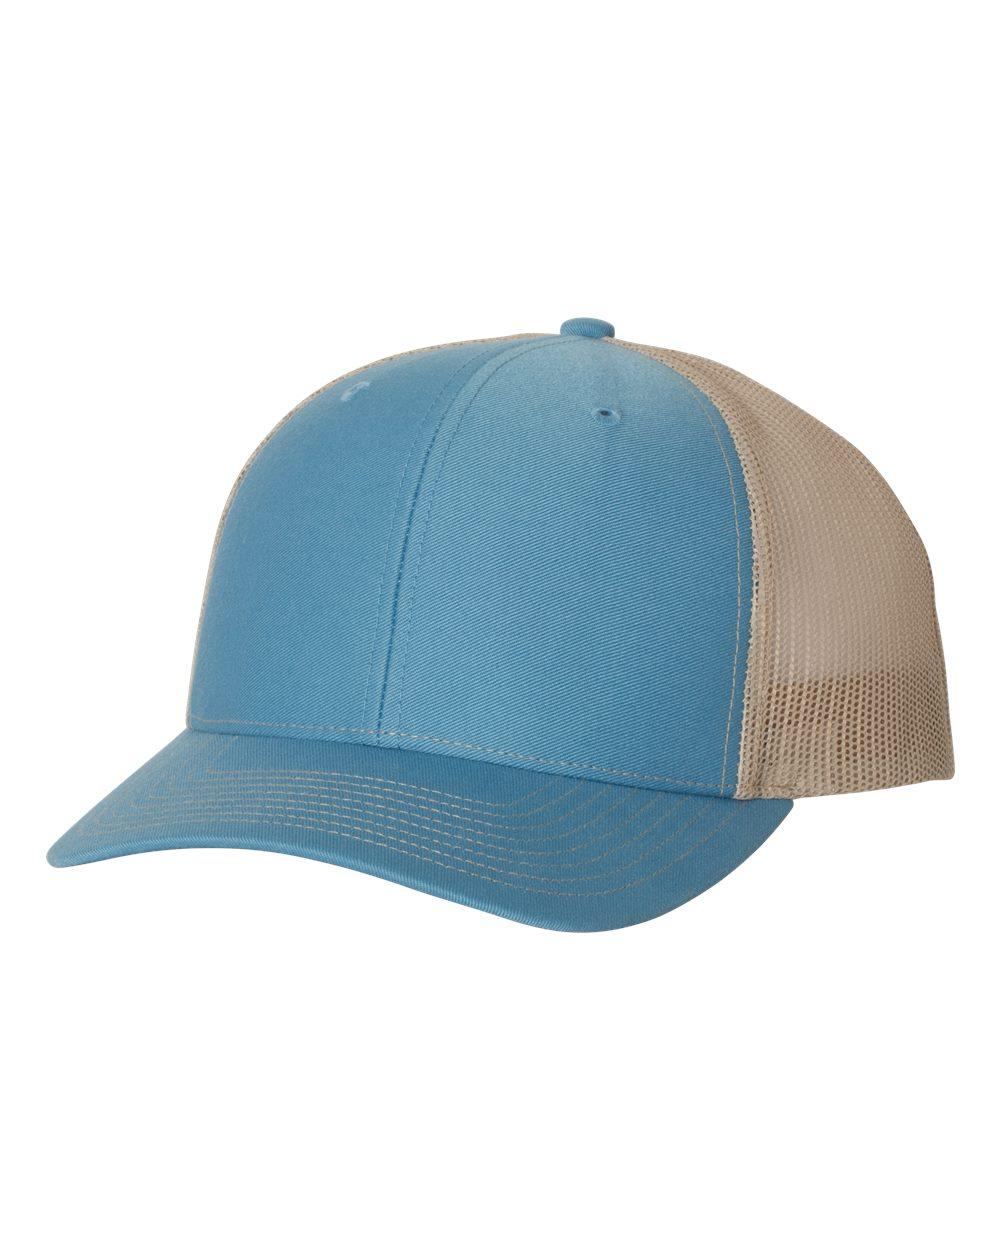 Colombia Blue/ Khaki